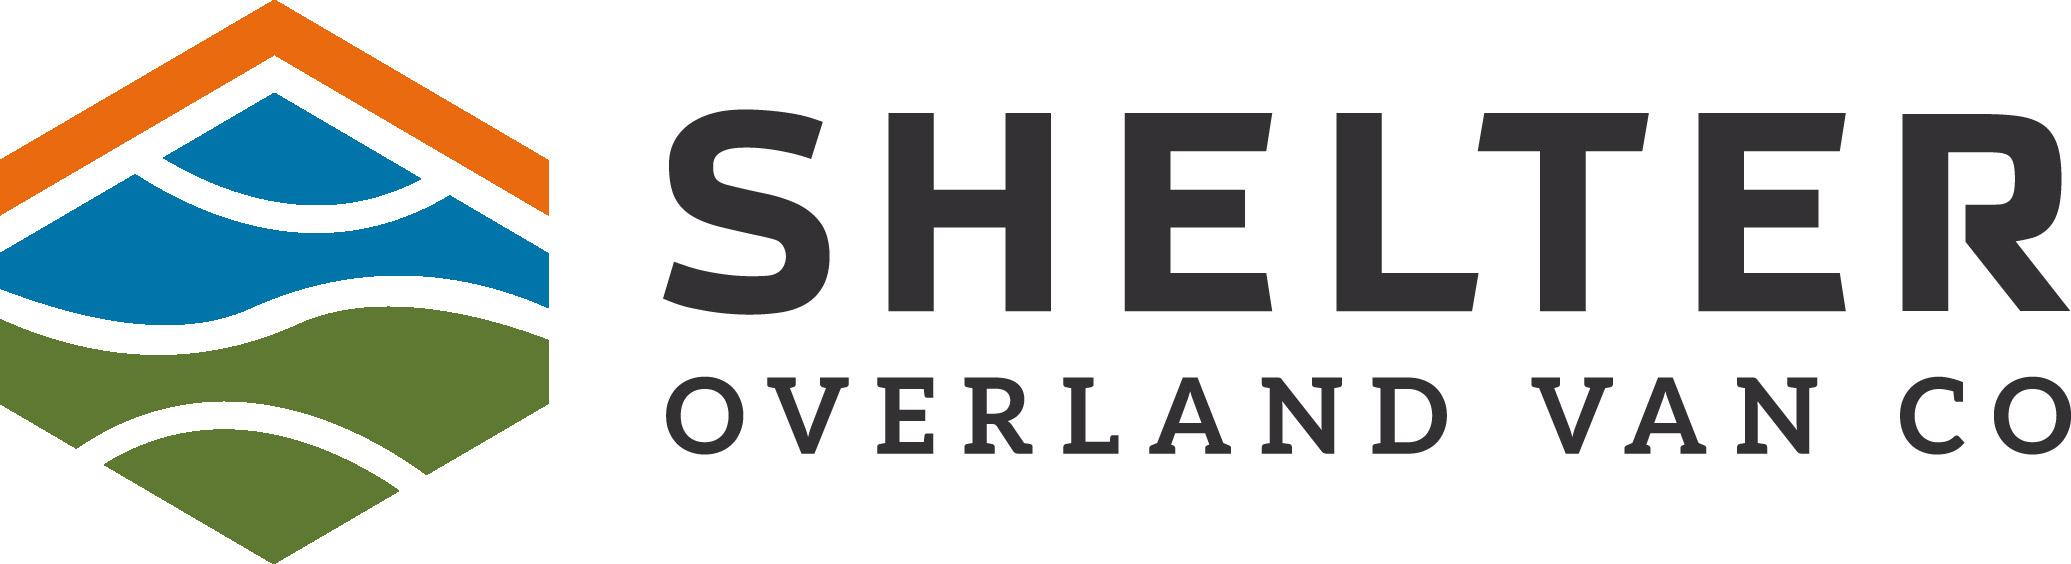 Shelter Overland Van Co